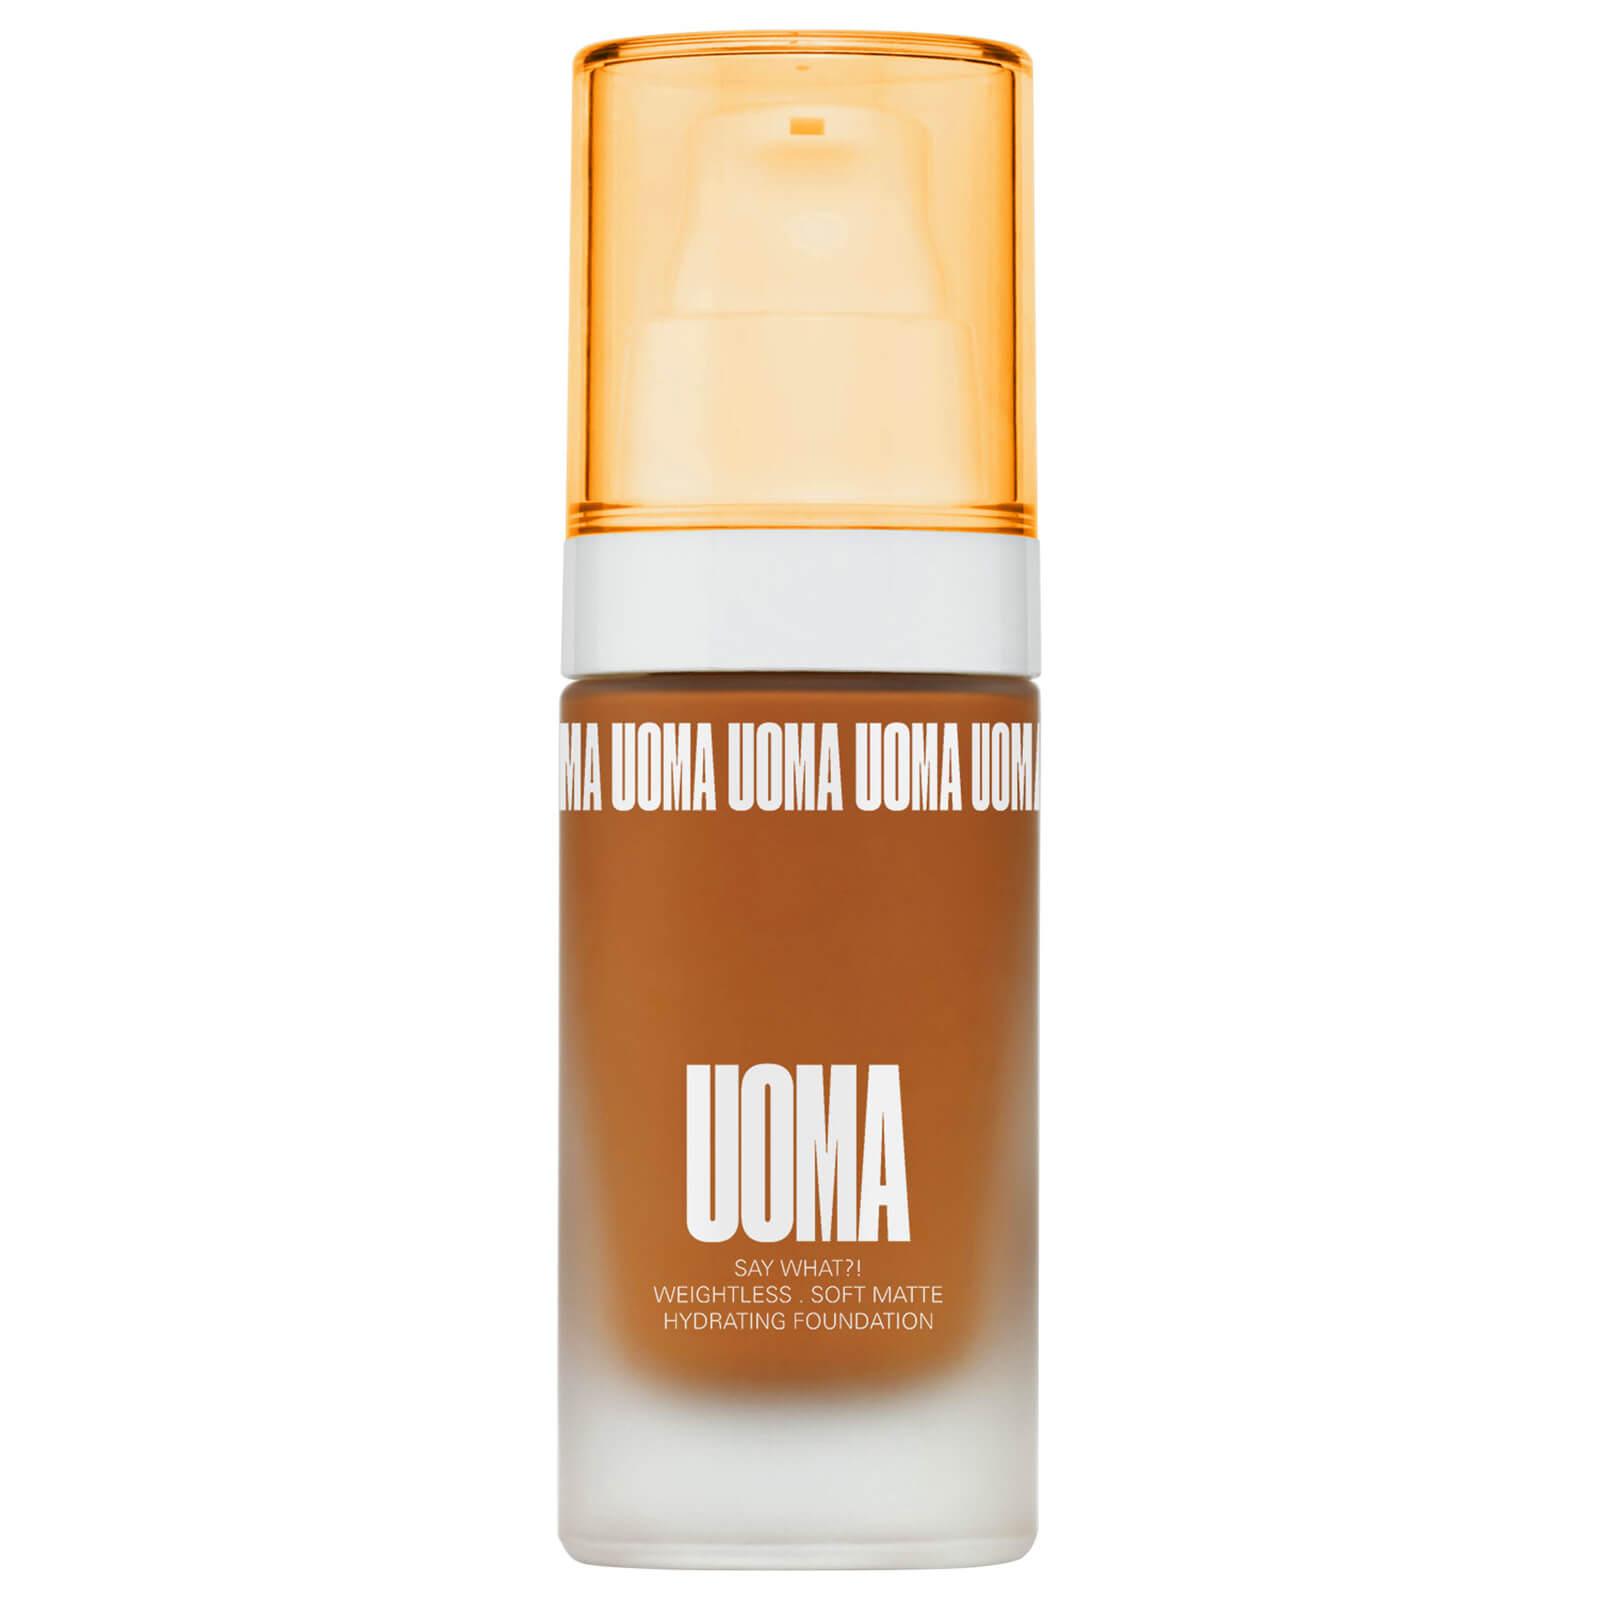 UOMA Beauty Say What Foundation 30ml (Various Shades) - Brown Sugar T1C